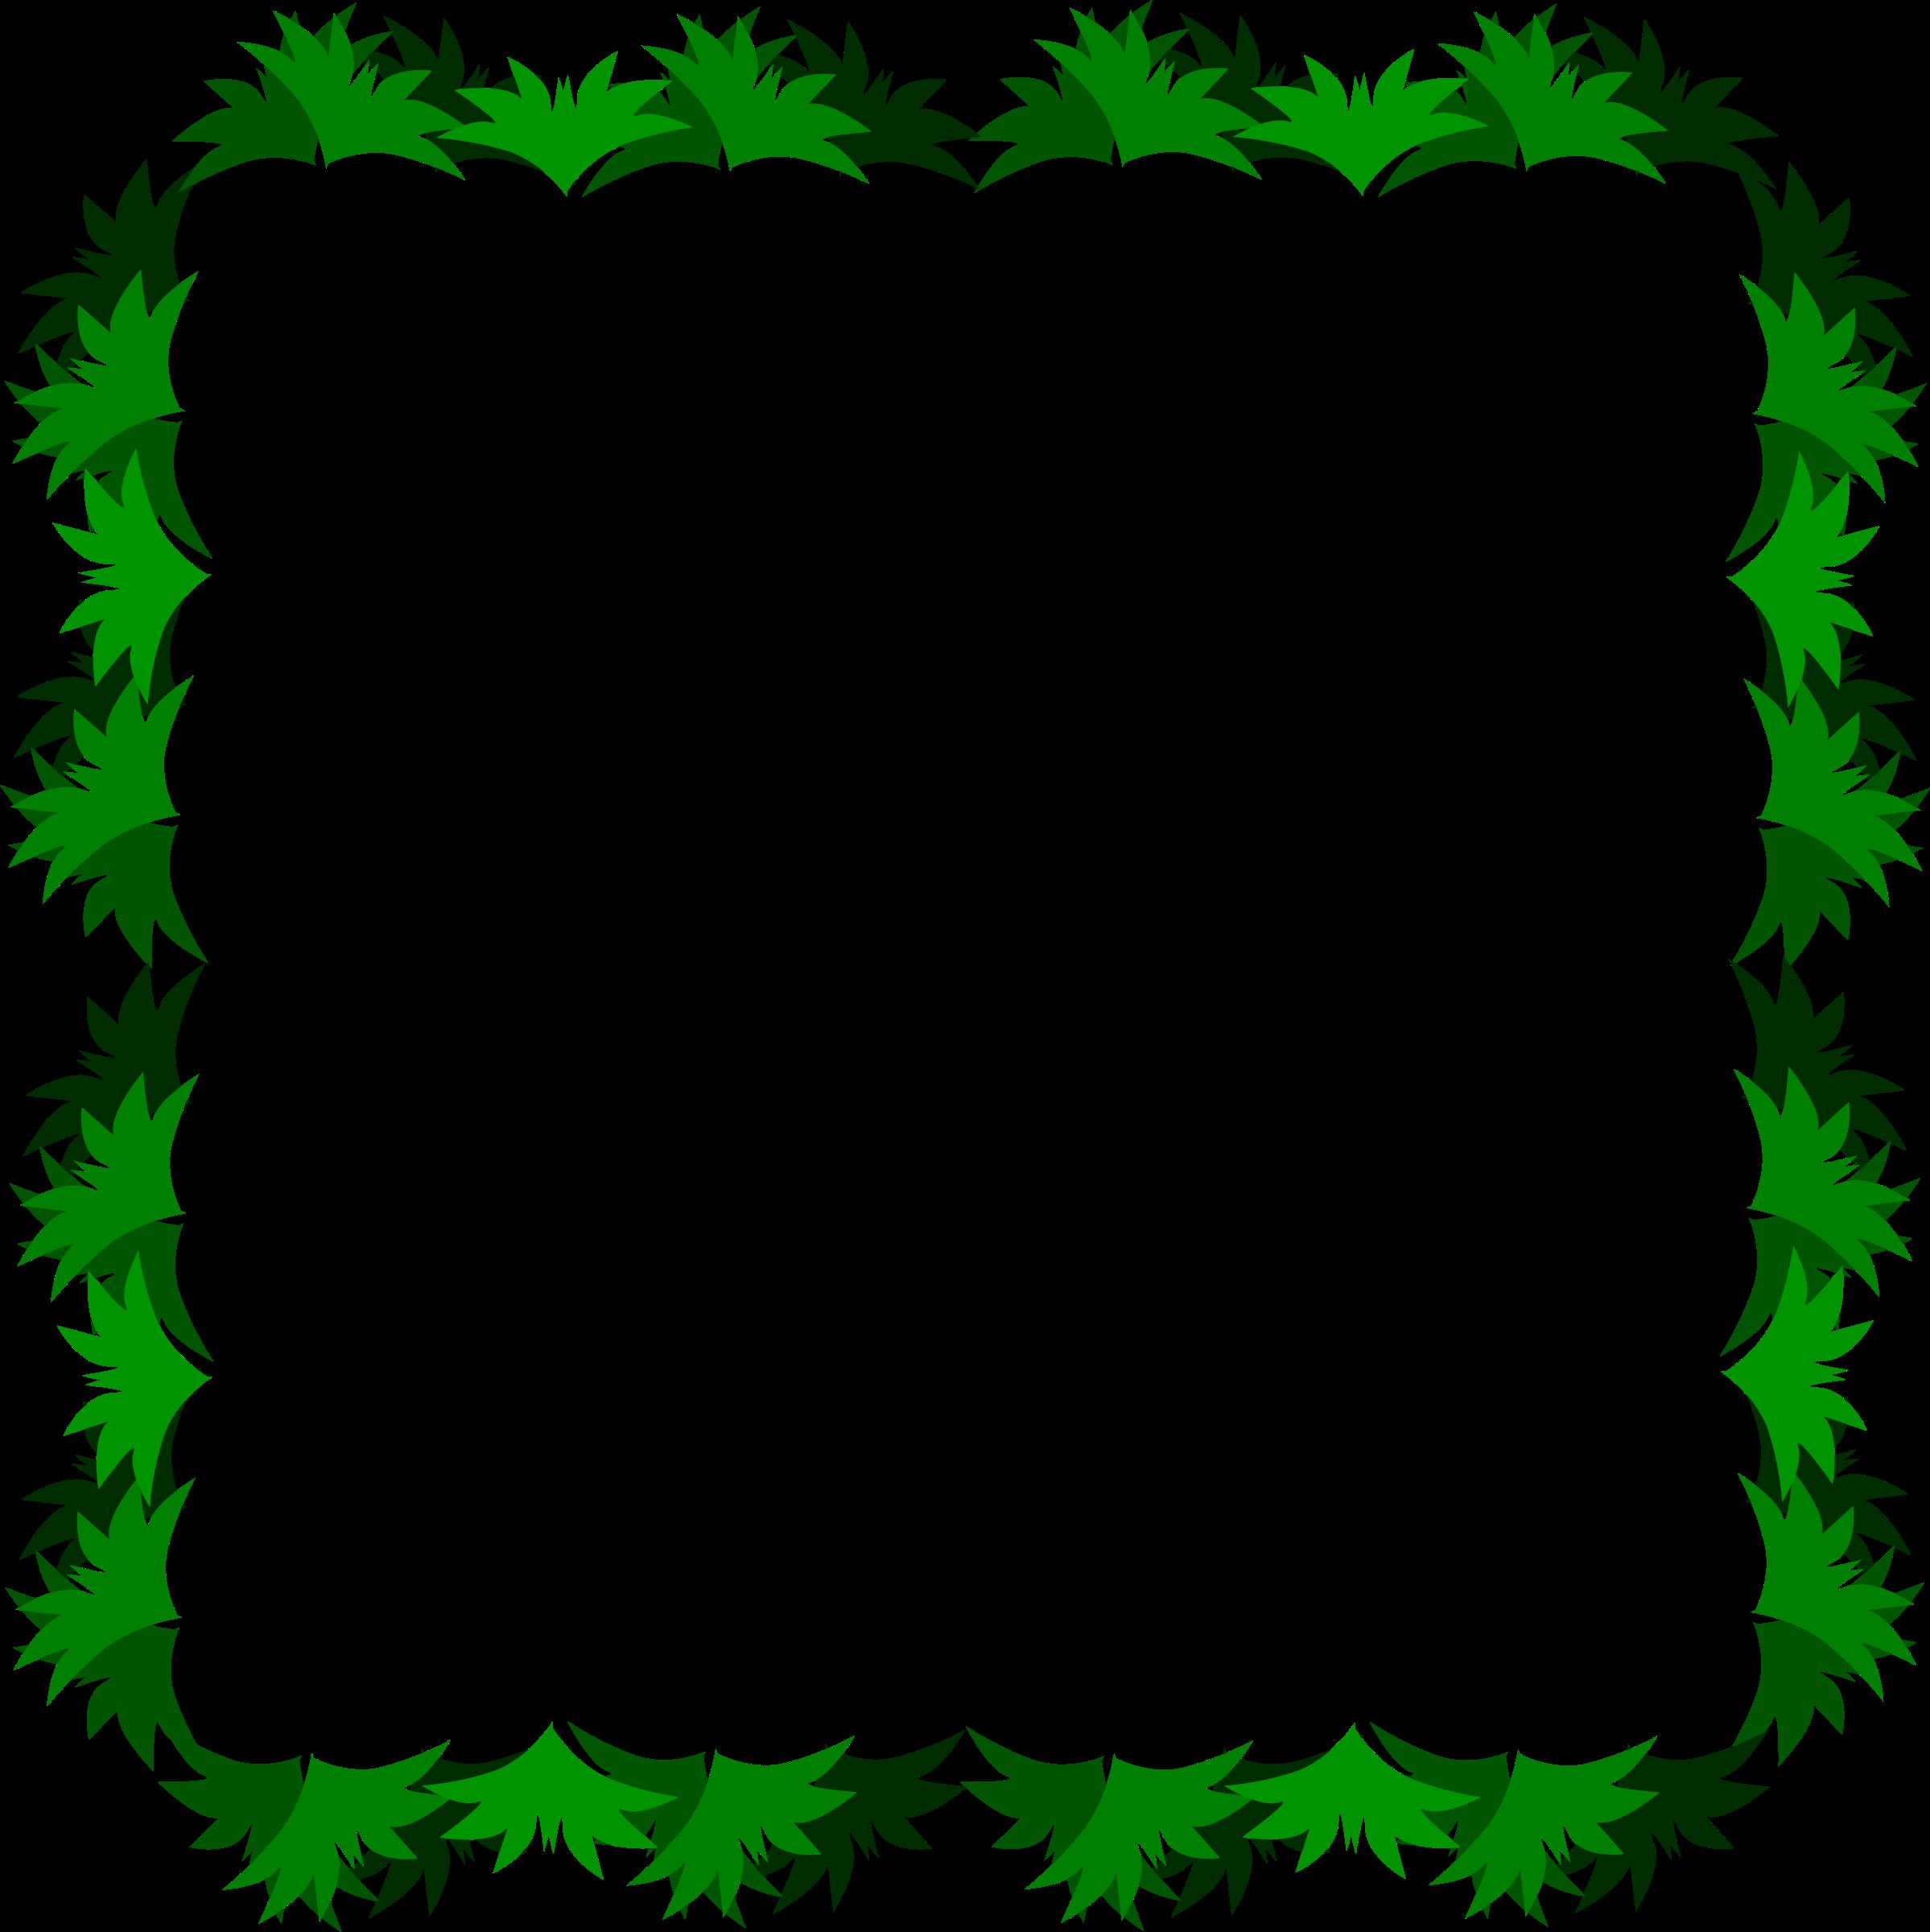 Sea Grass clipart grass border #14